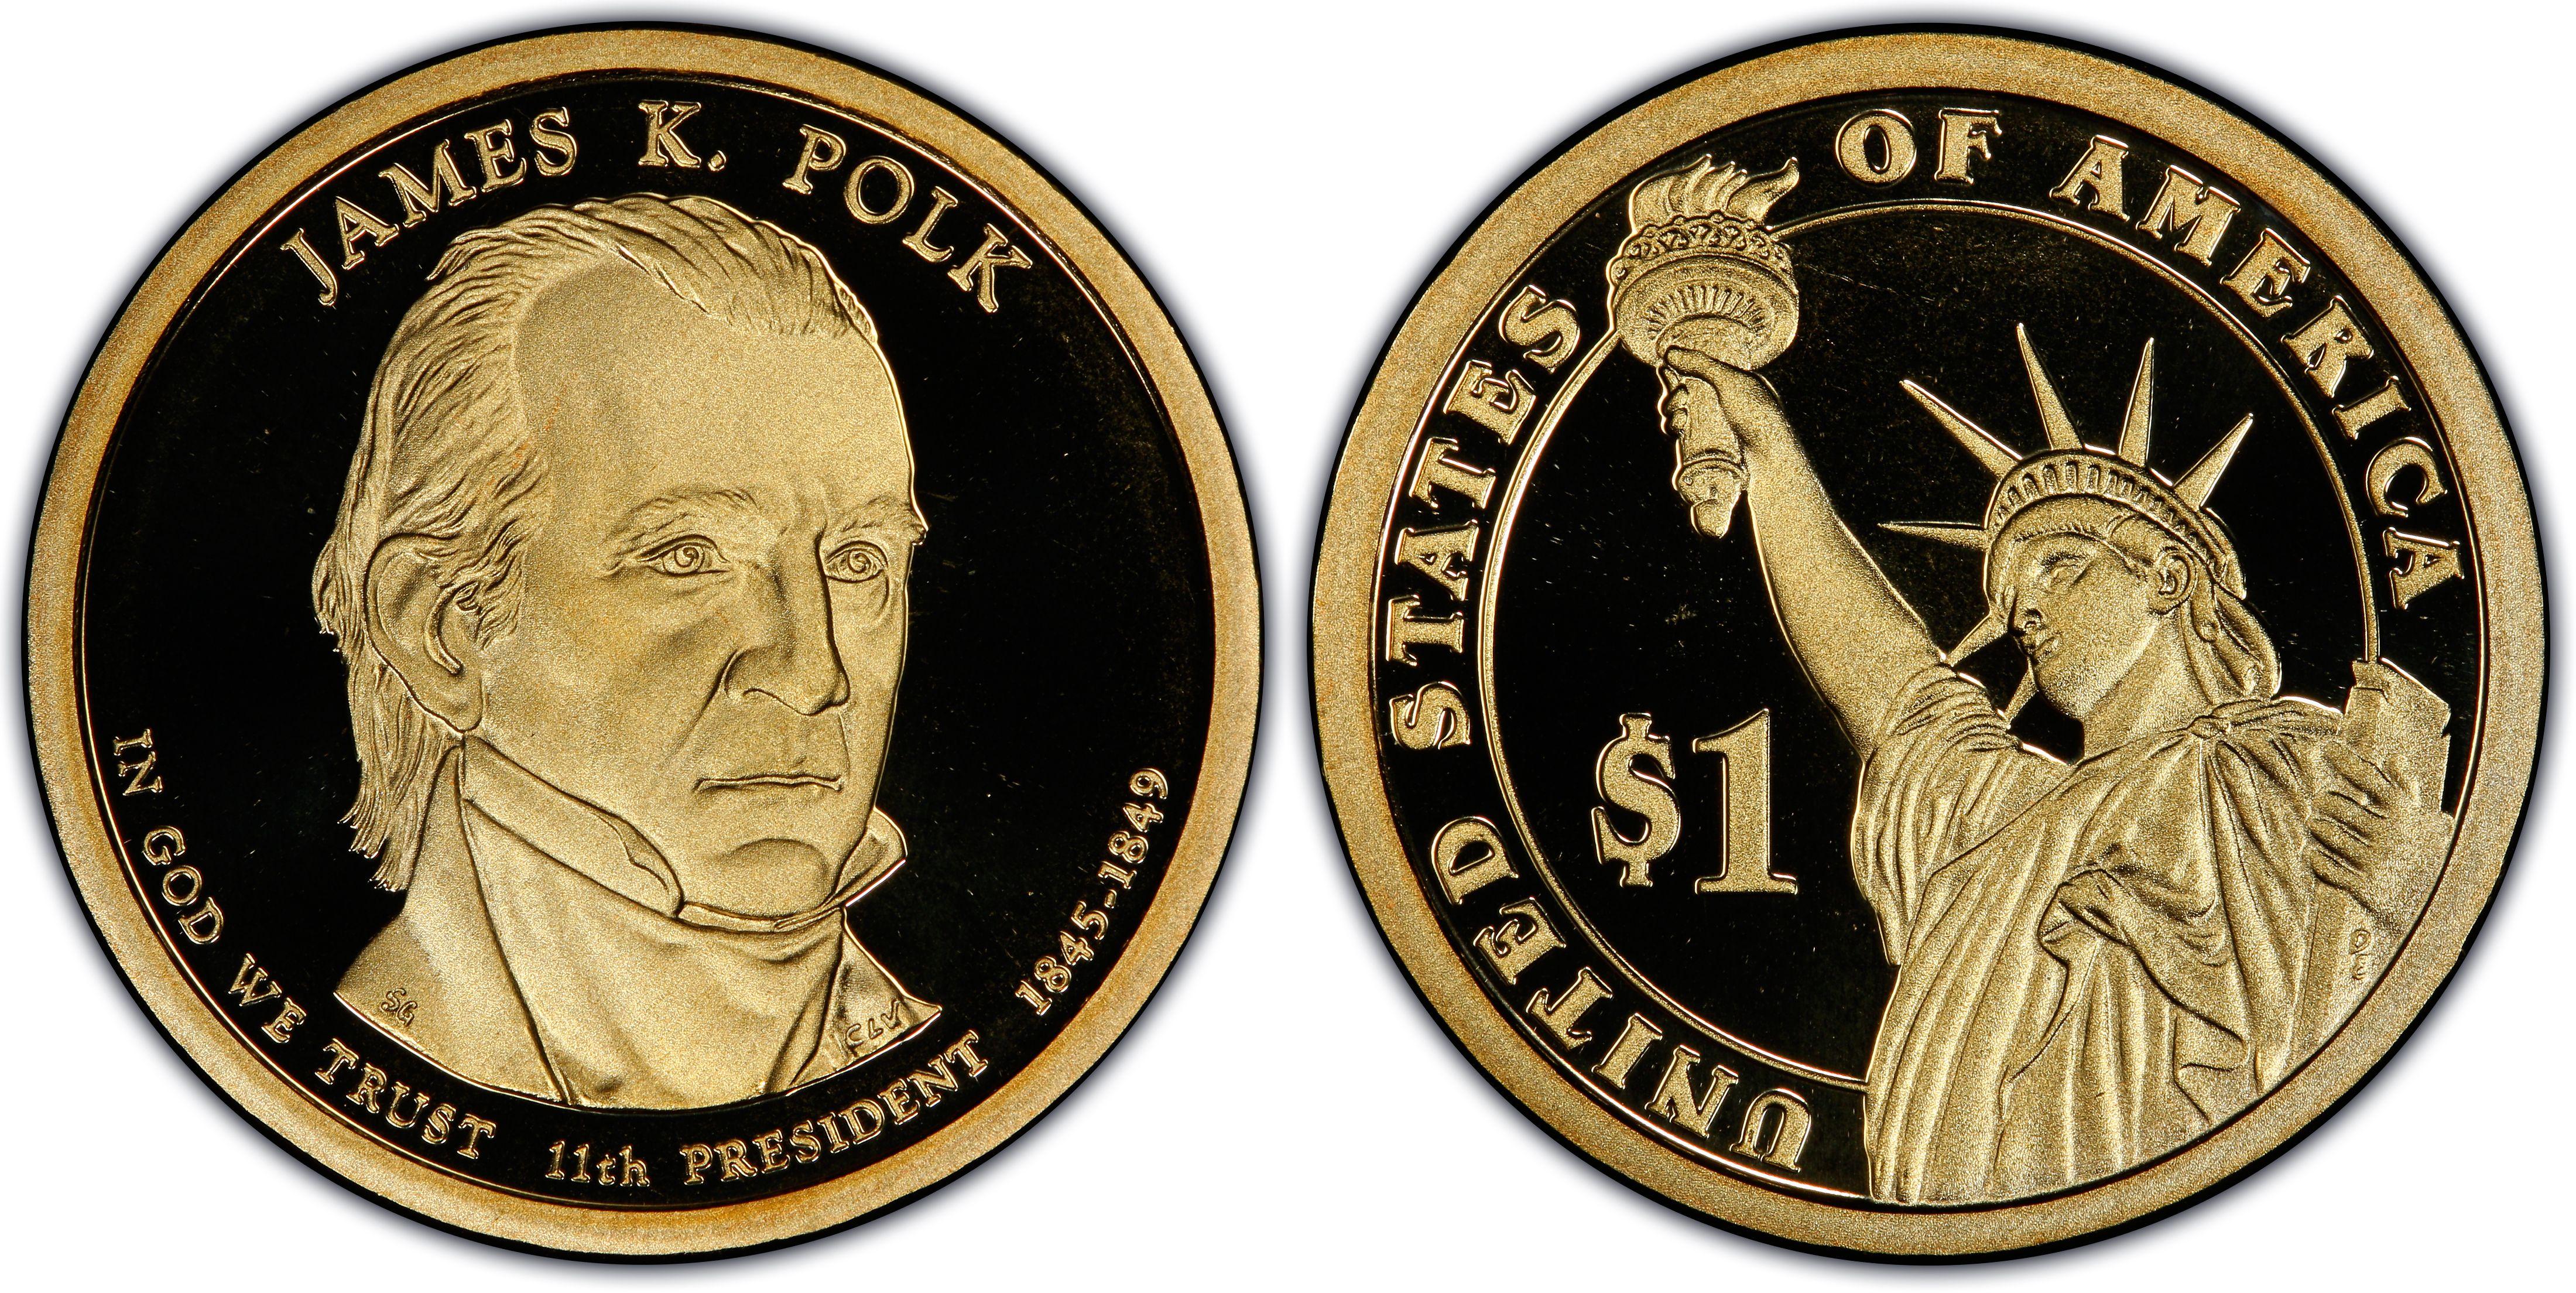 NGC 2009-S Proof JAMES K POLK 11th Presidential Dollar PR PF69 USA Mint $1 Coin